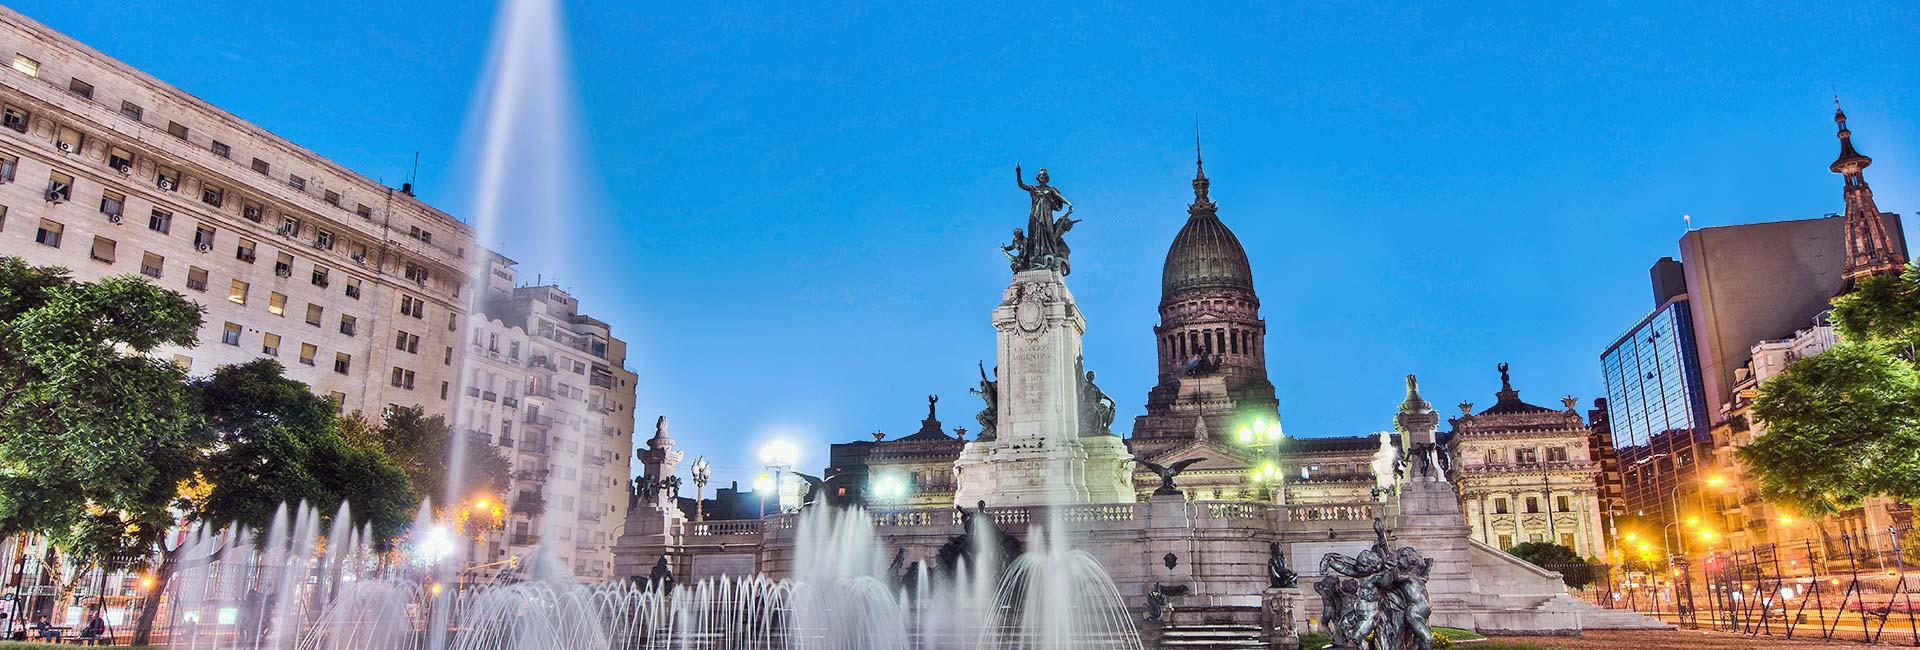 Appartamenti Città di Buenos Aires Header Image